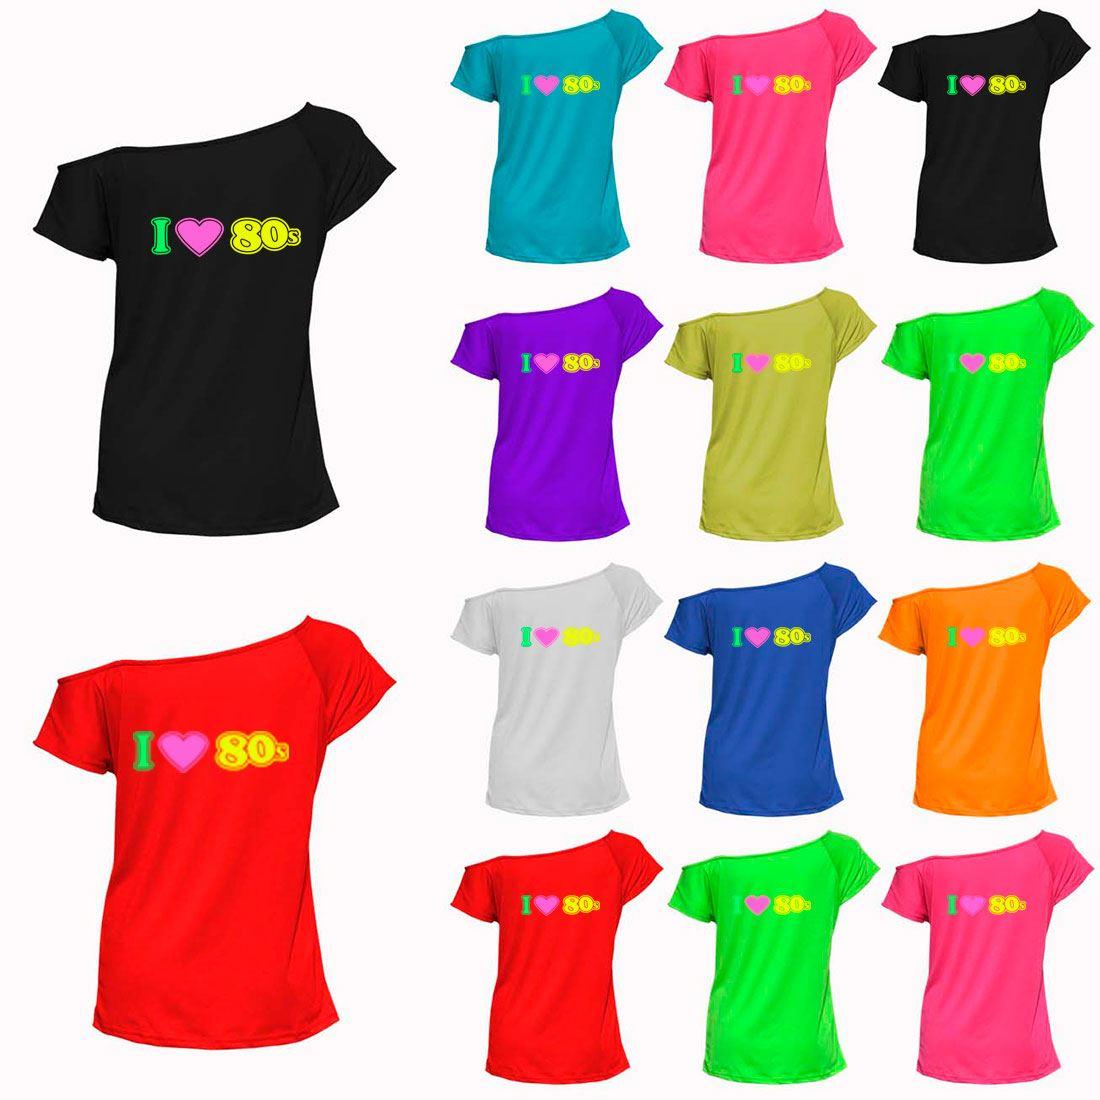 Black I Love The 1980s Retro T-Shirt Party Hen Night Fancy Dress Top 6018735®